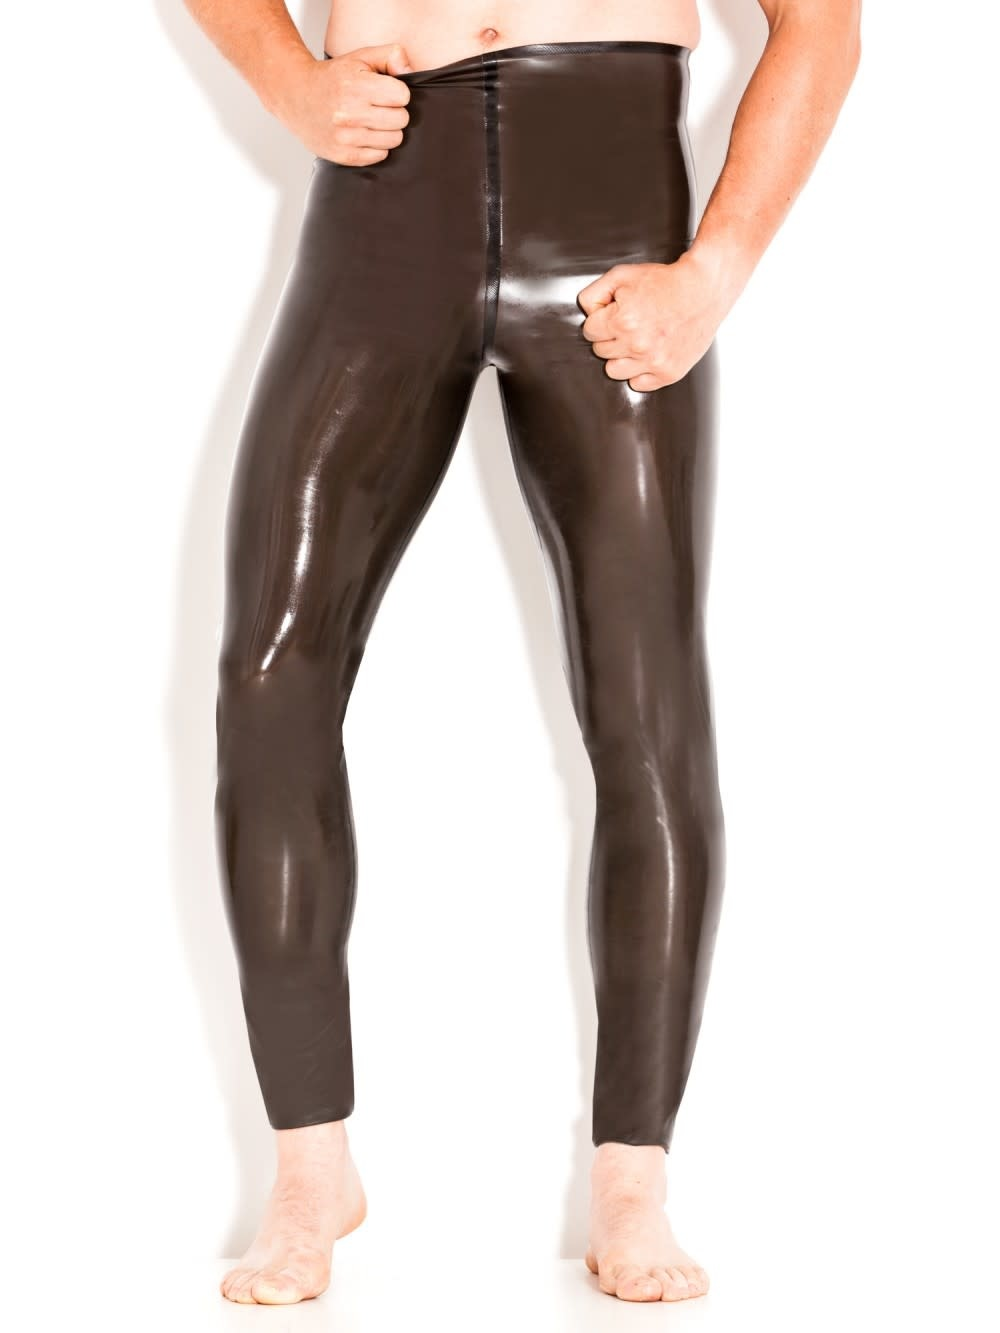 Latex Semi-Transparent Leggings